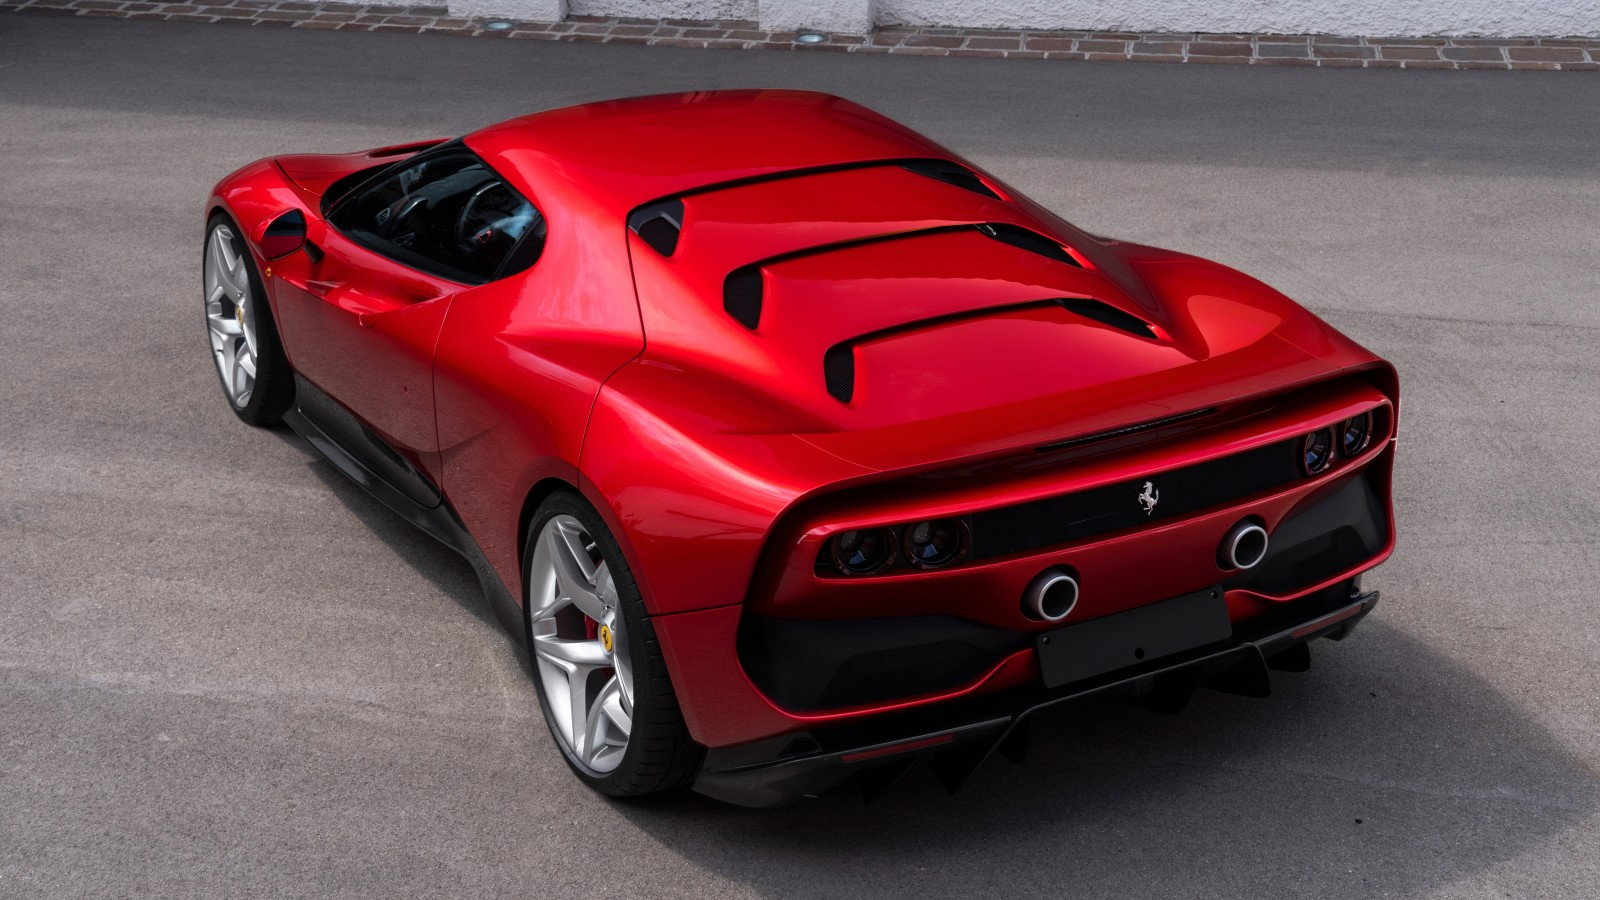 Inside the New Ferrari SP38 - A Modern F40?